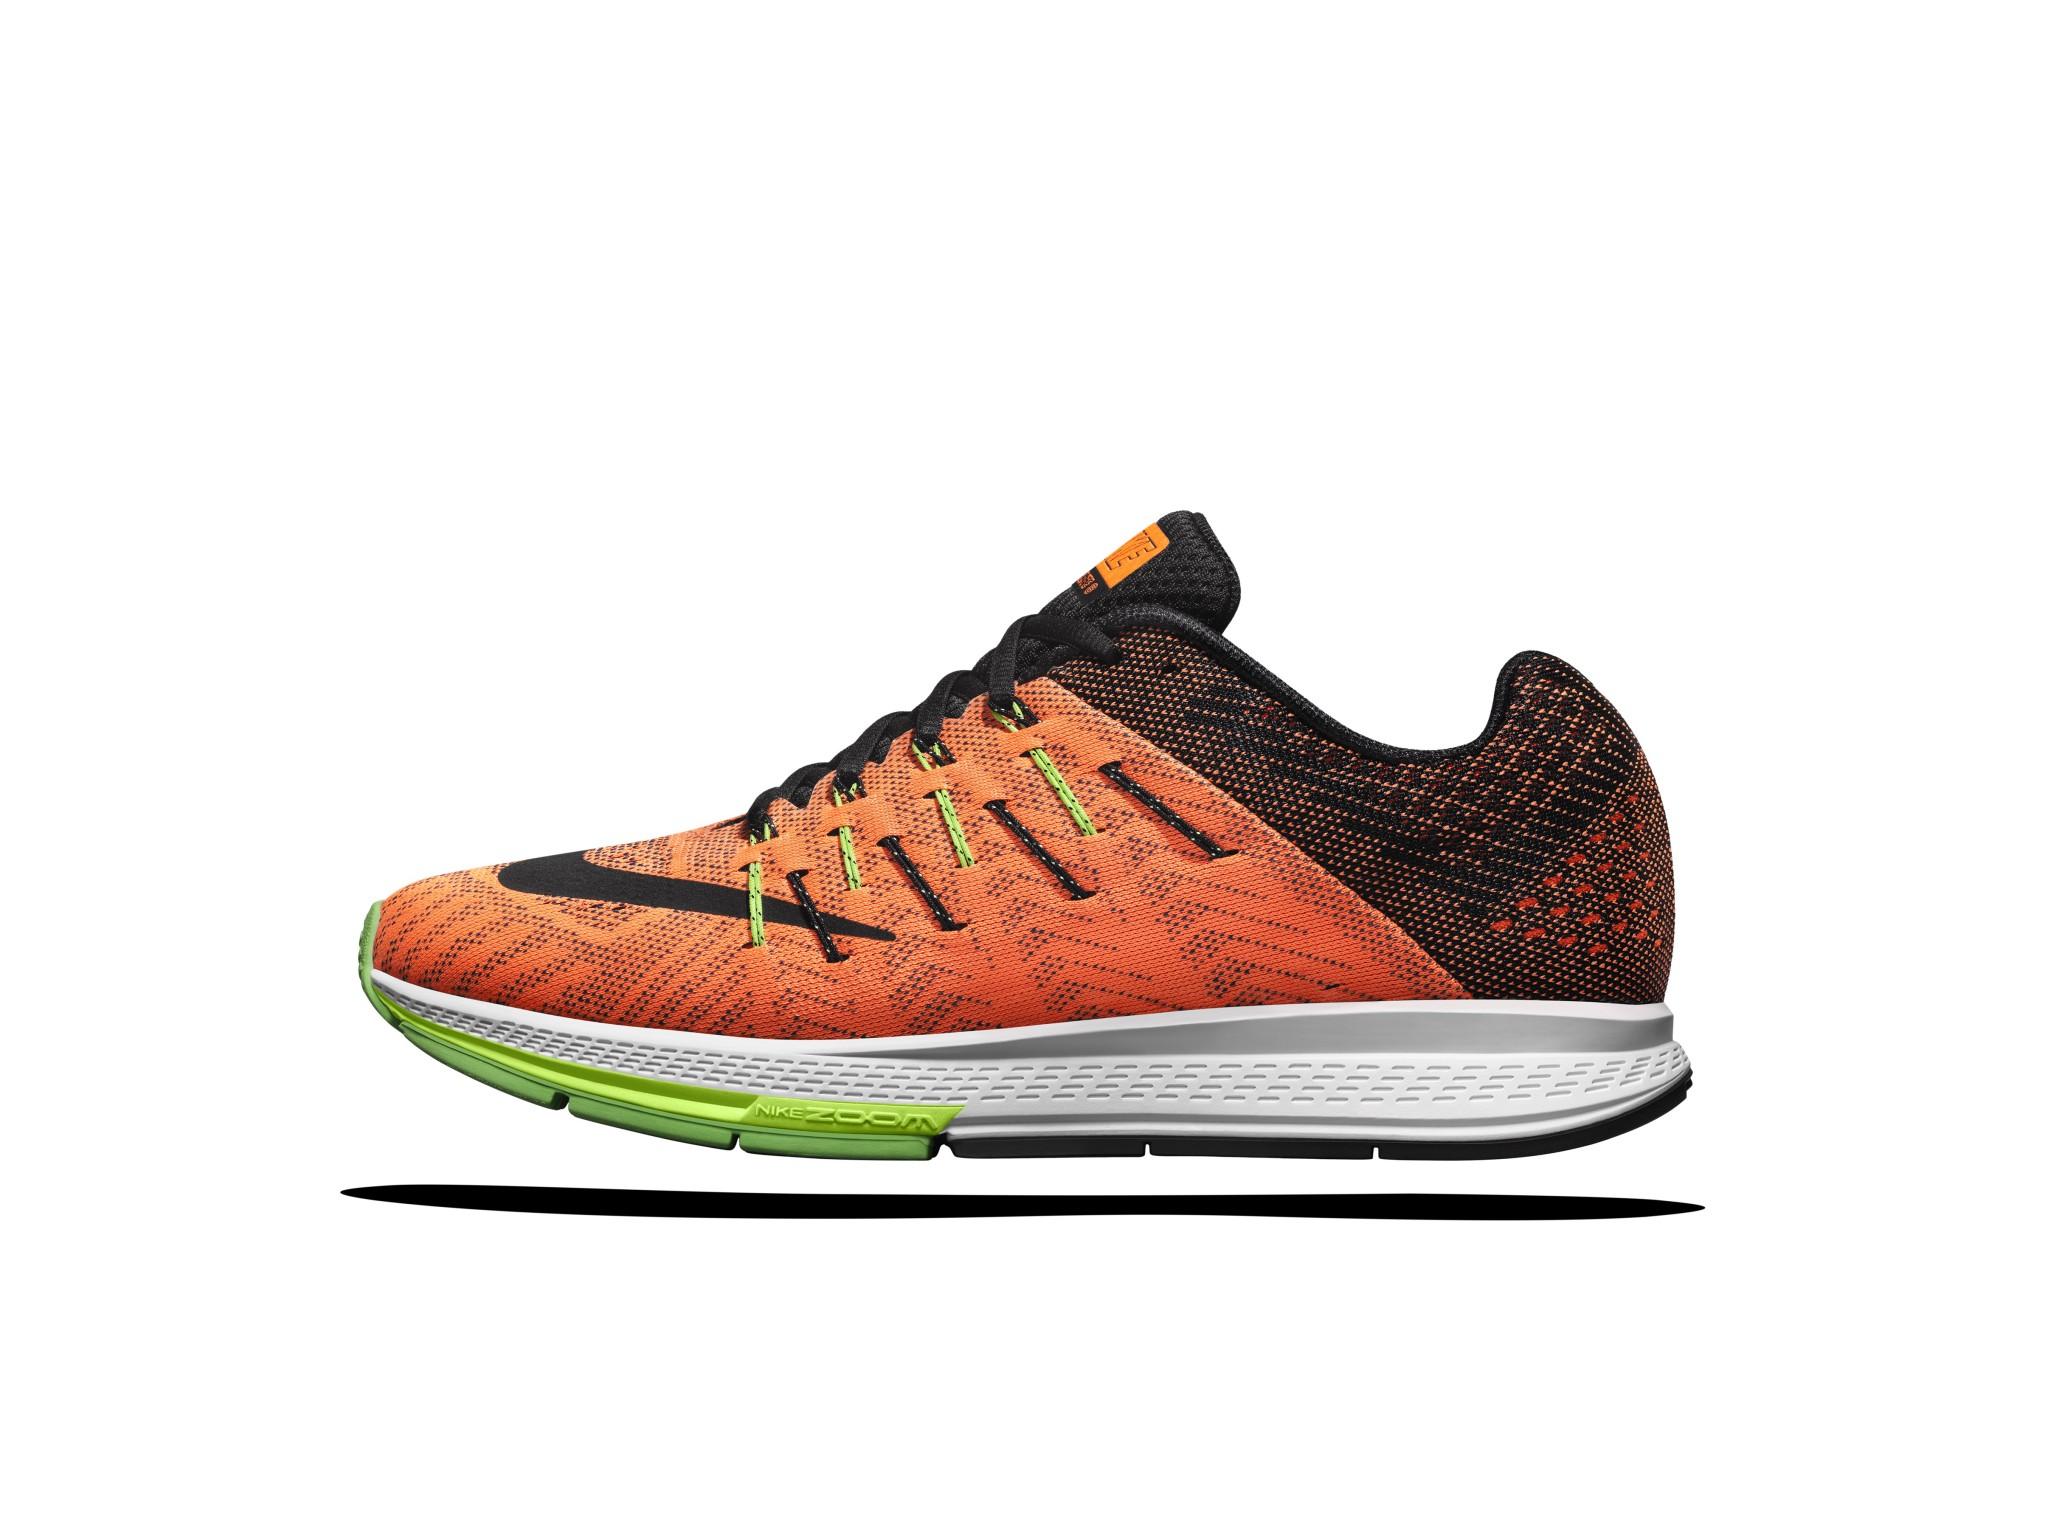 pretty nice 38d35 0e494 Nike Air Zoom Elite 8 : un contraste surprenant - Runner's World